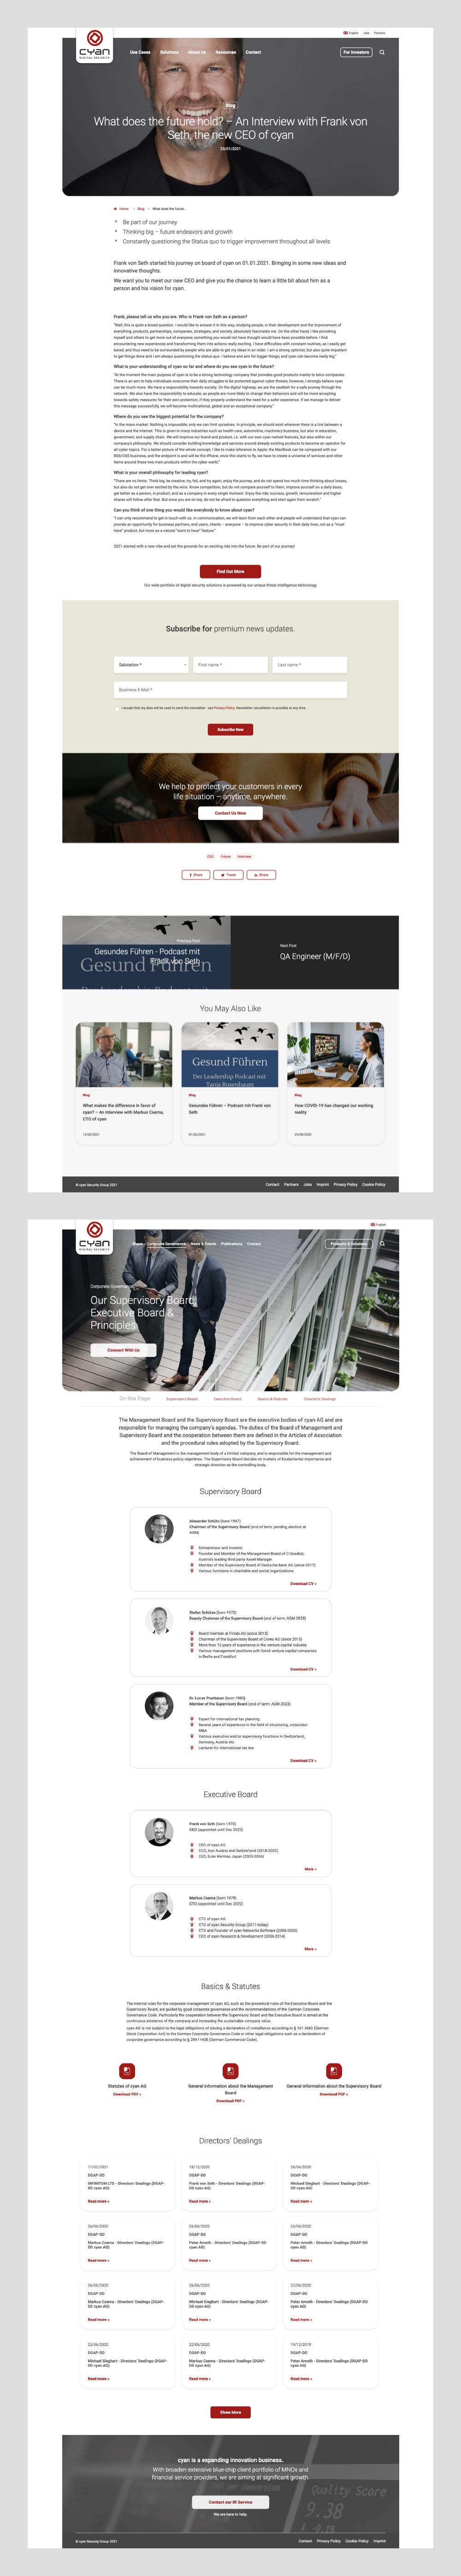 Cyan Digital Security Webdesign by dmcgroup